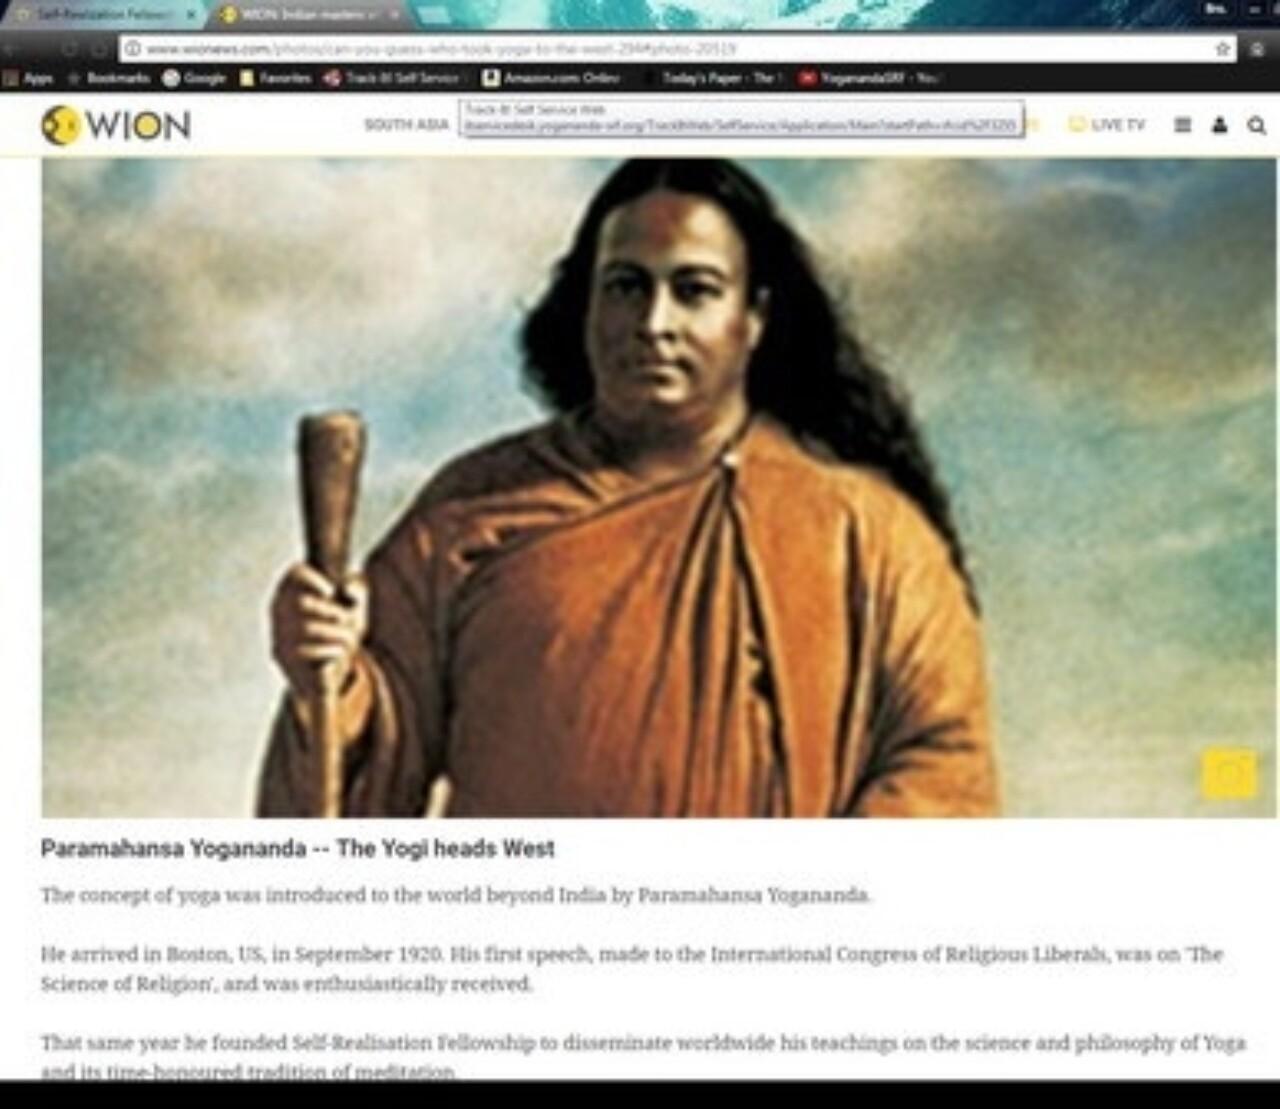 Wion features Paramahansa Yogananda